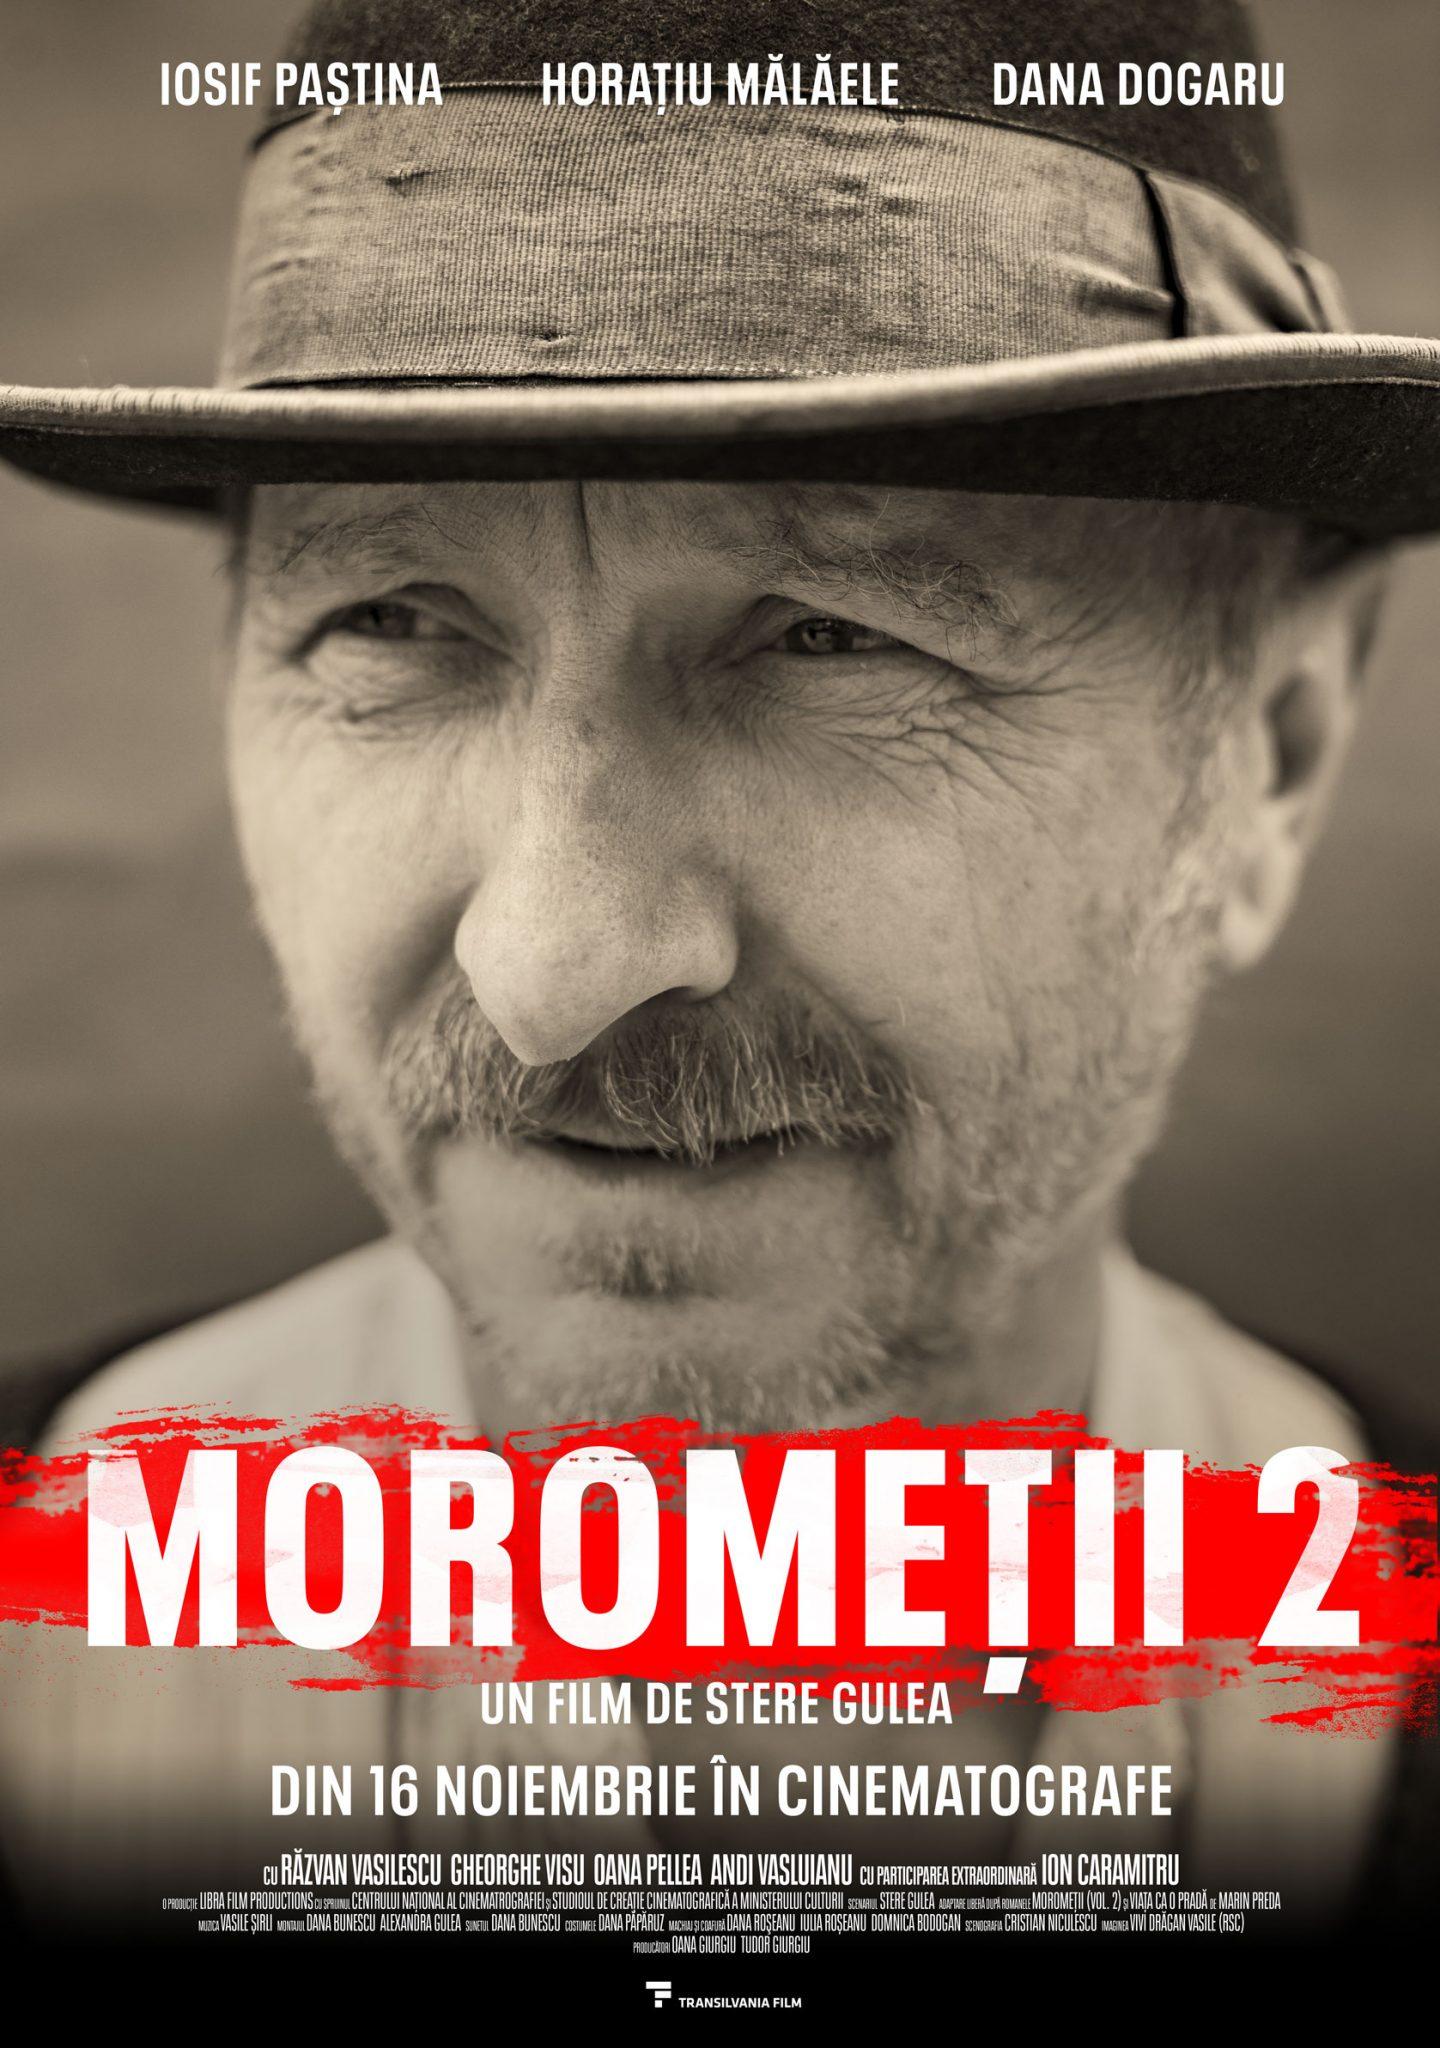 Morometii 2_afis (photo by Alex Galmeanu)